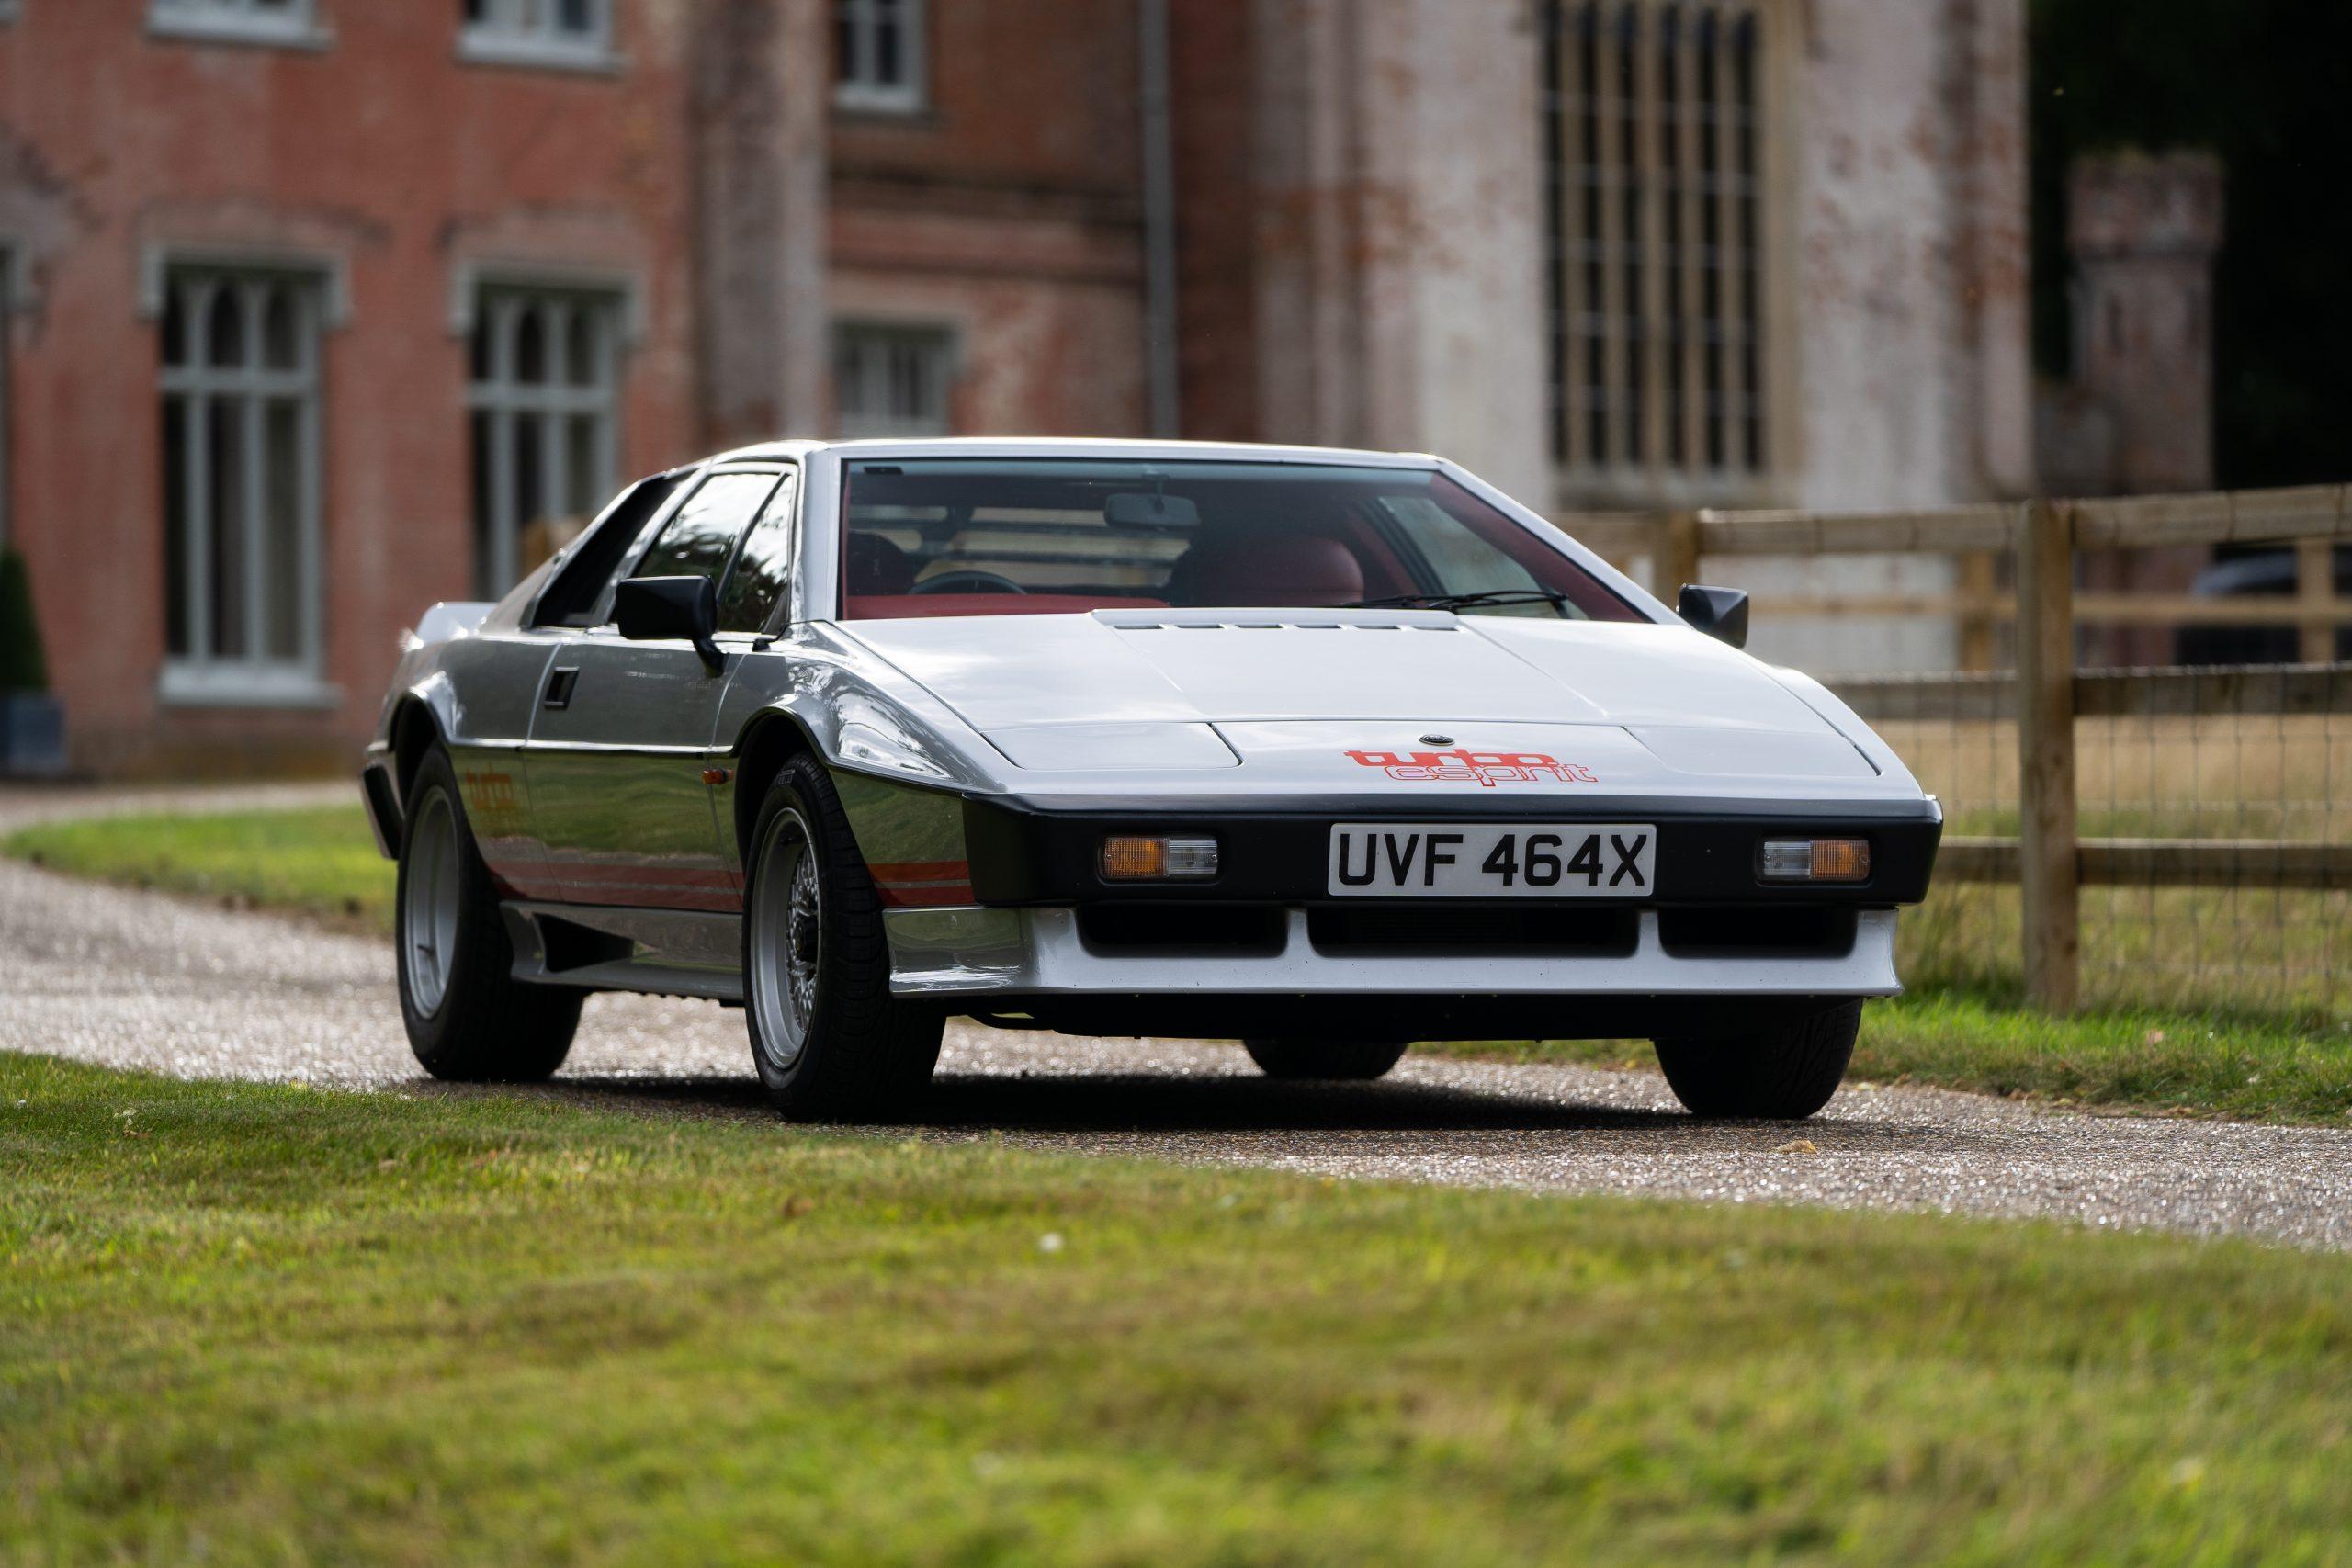 Colin Chapman Lotus Esprit Turbo